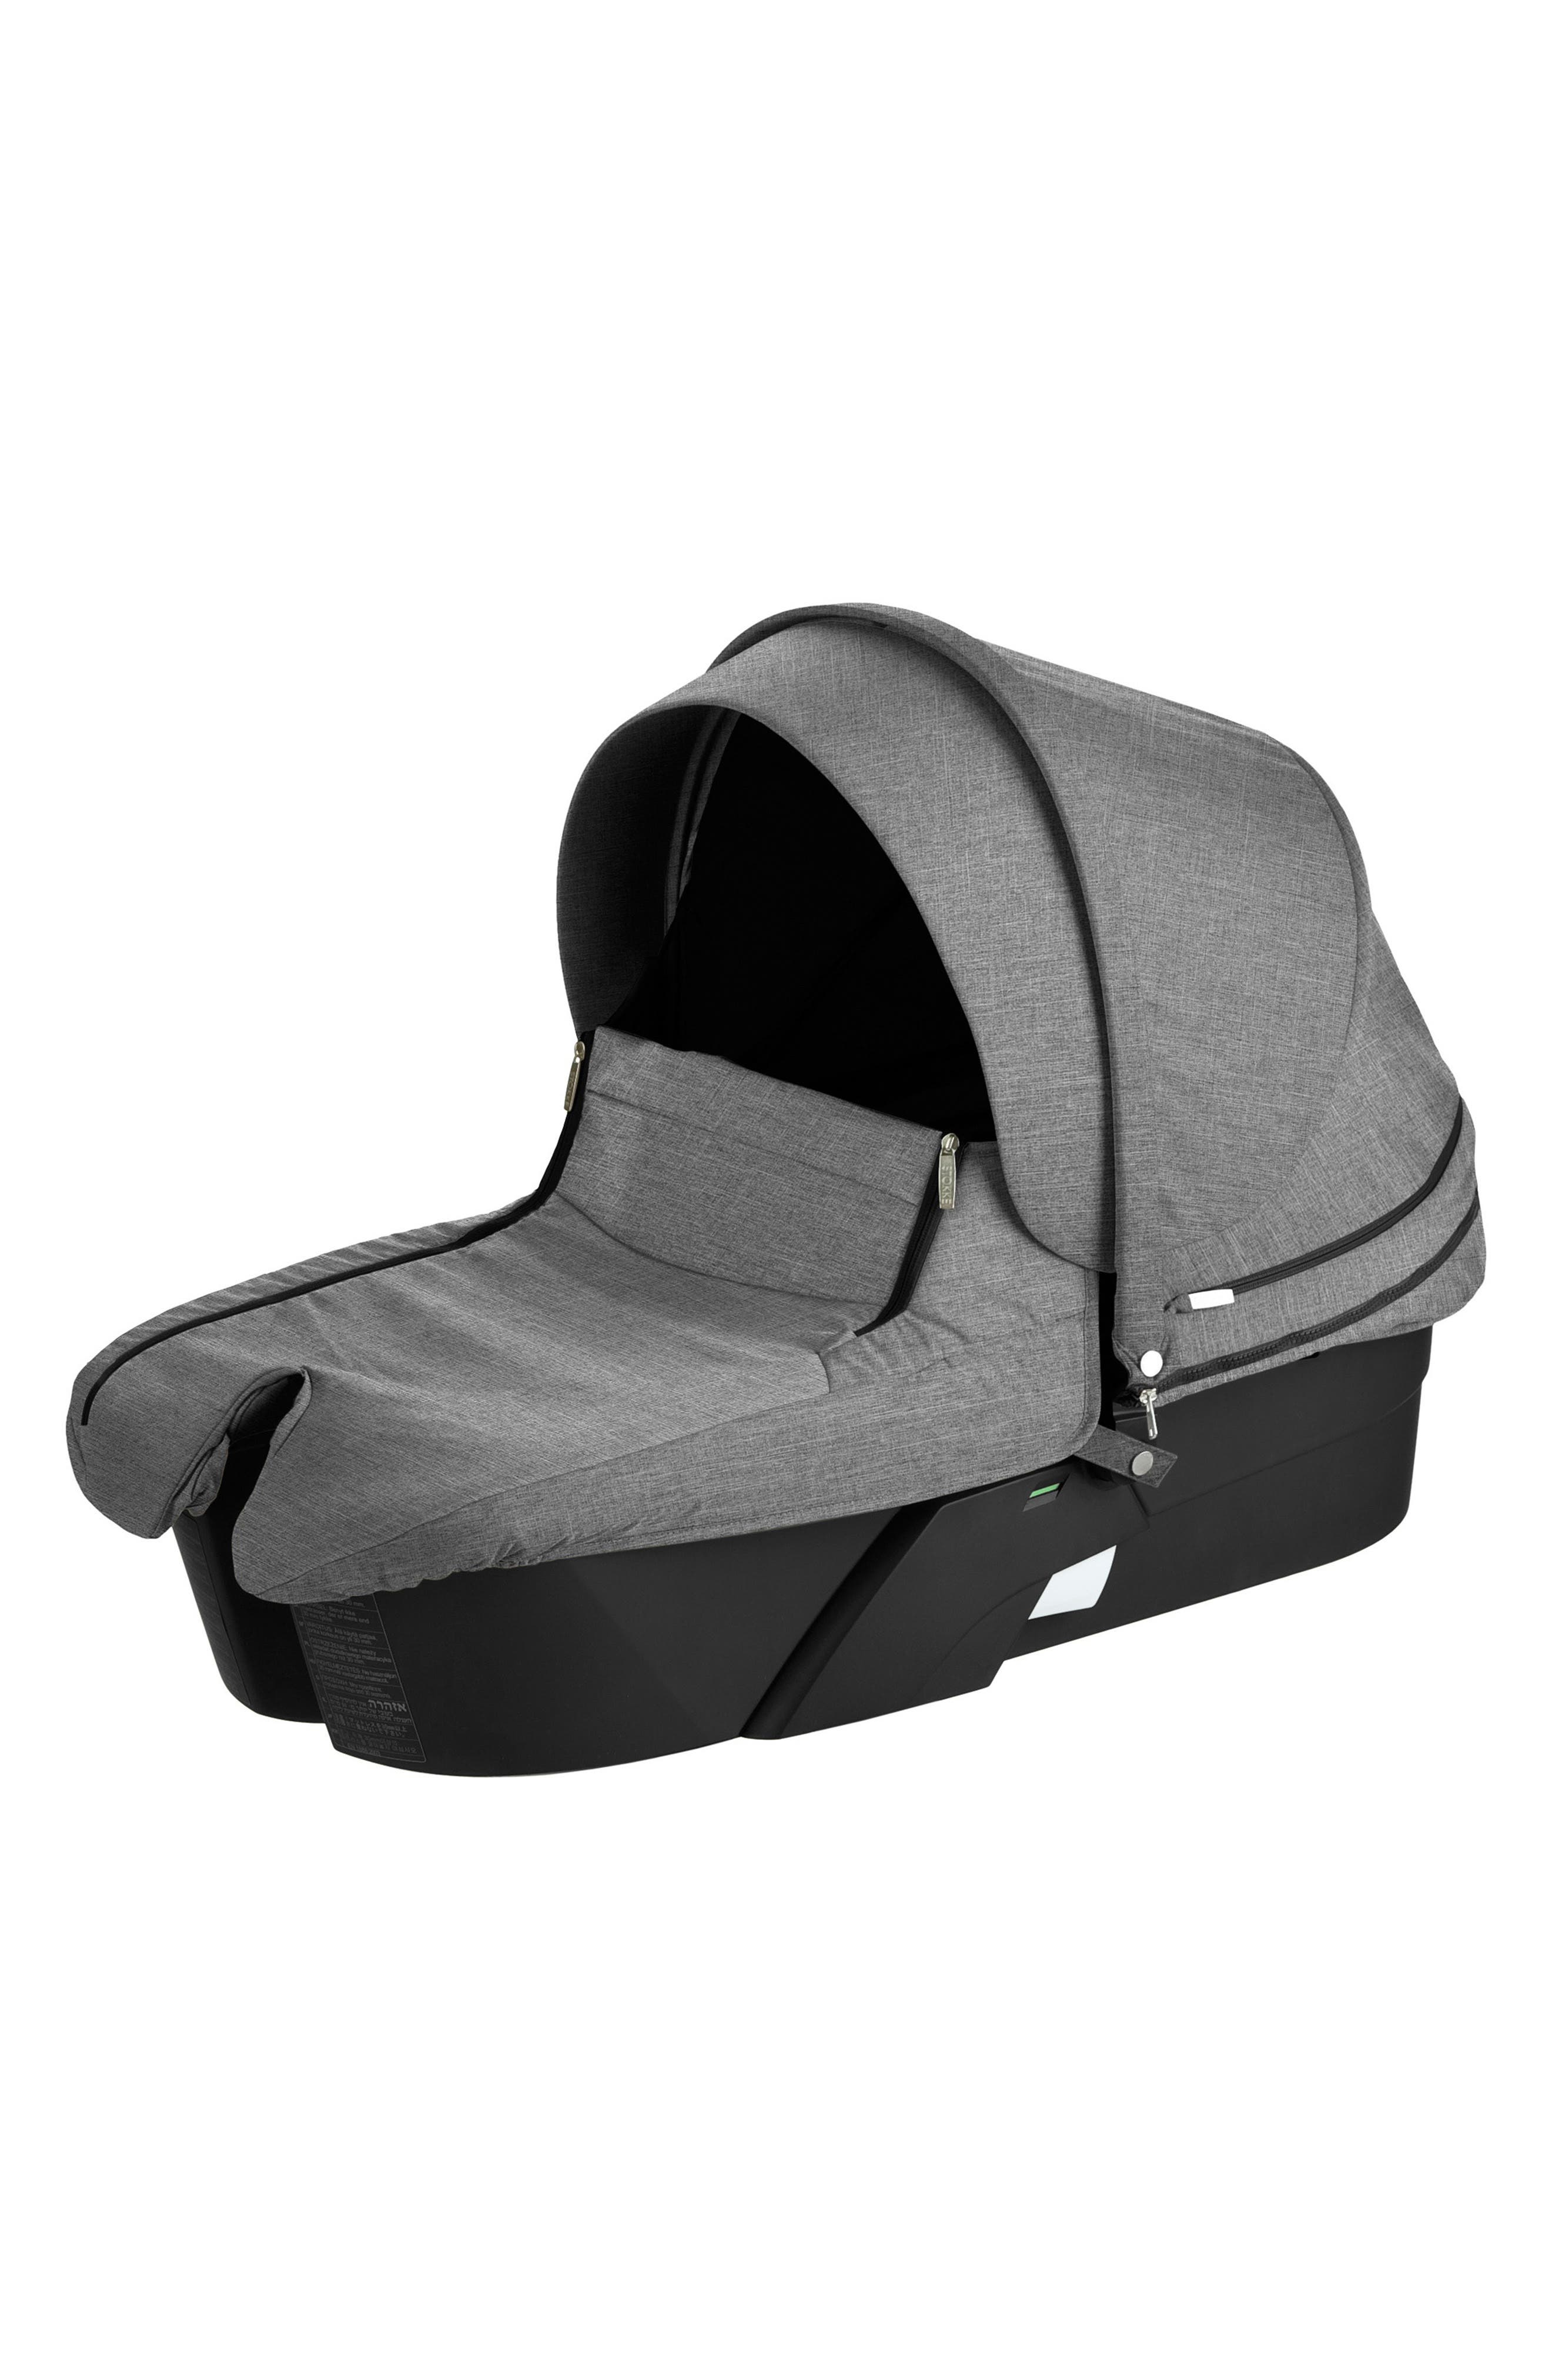 STOKKE, Xplory<sup>®</sup> Stroller Carry Cot, Main thumbnail 1, color, 001